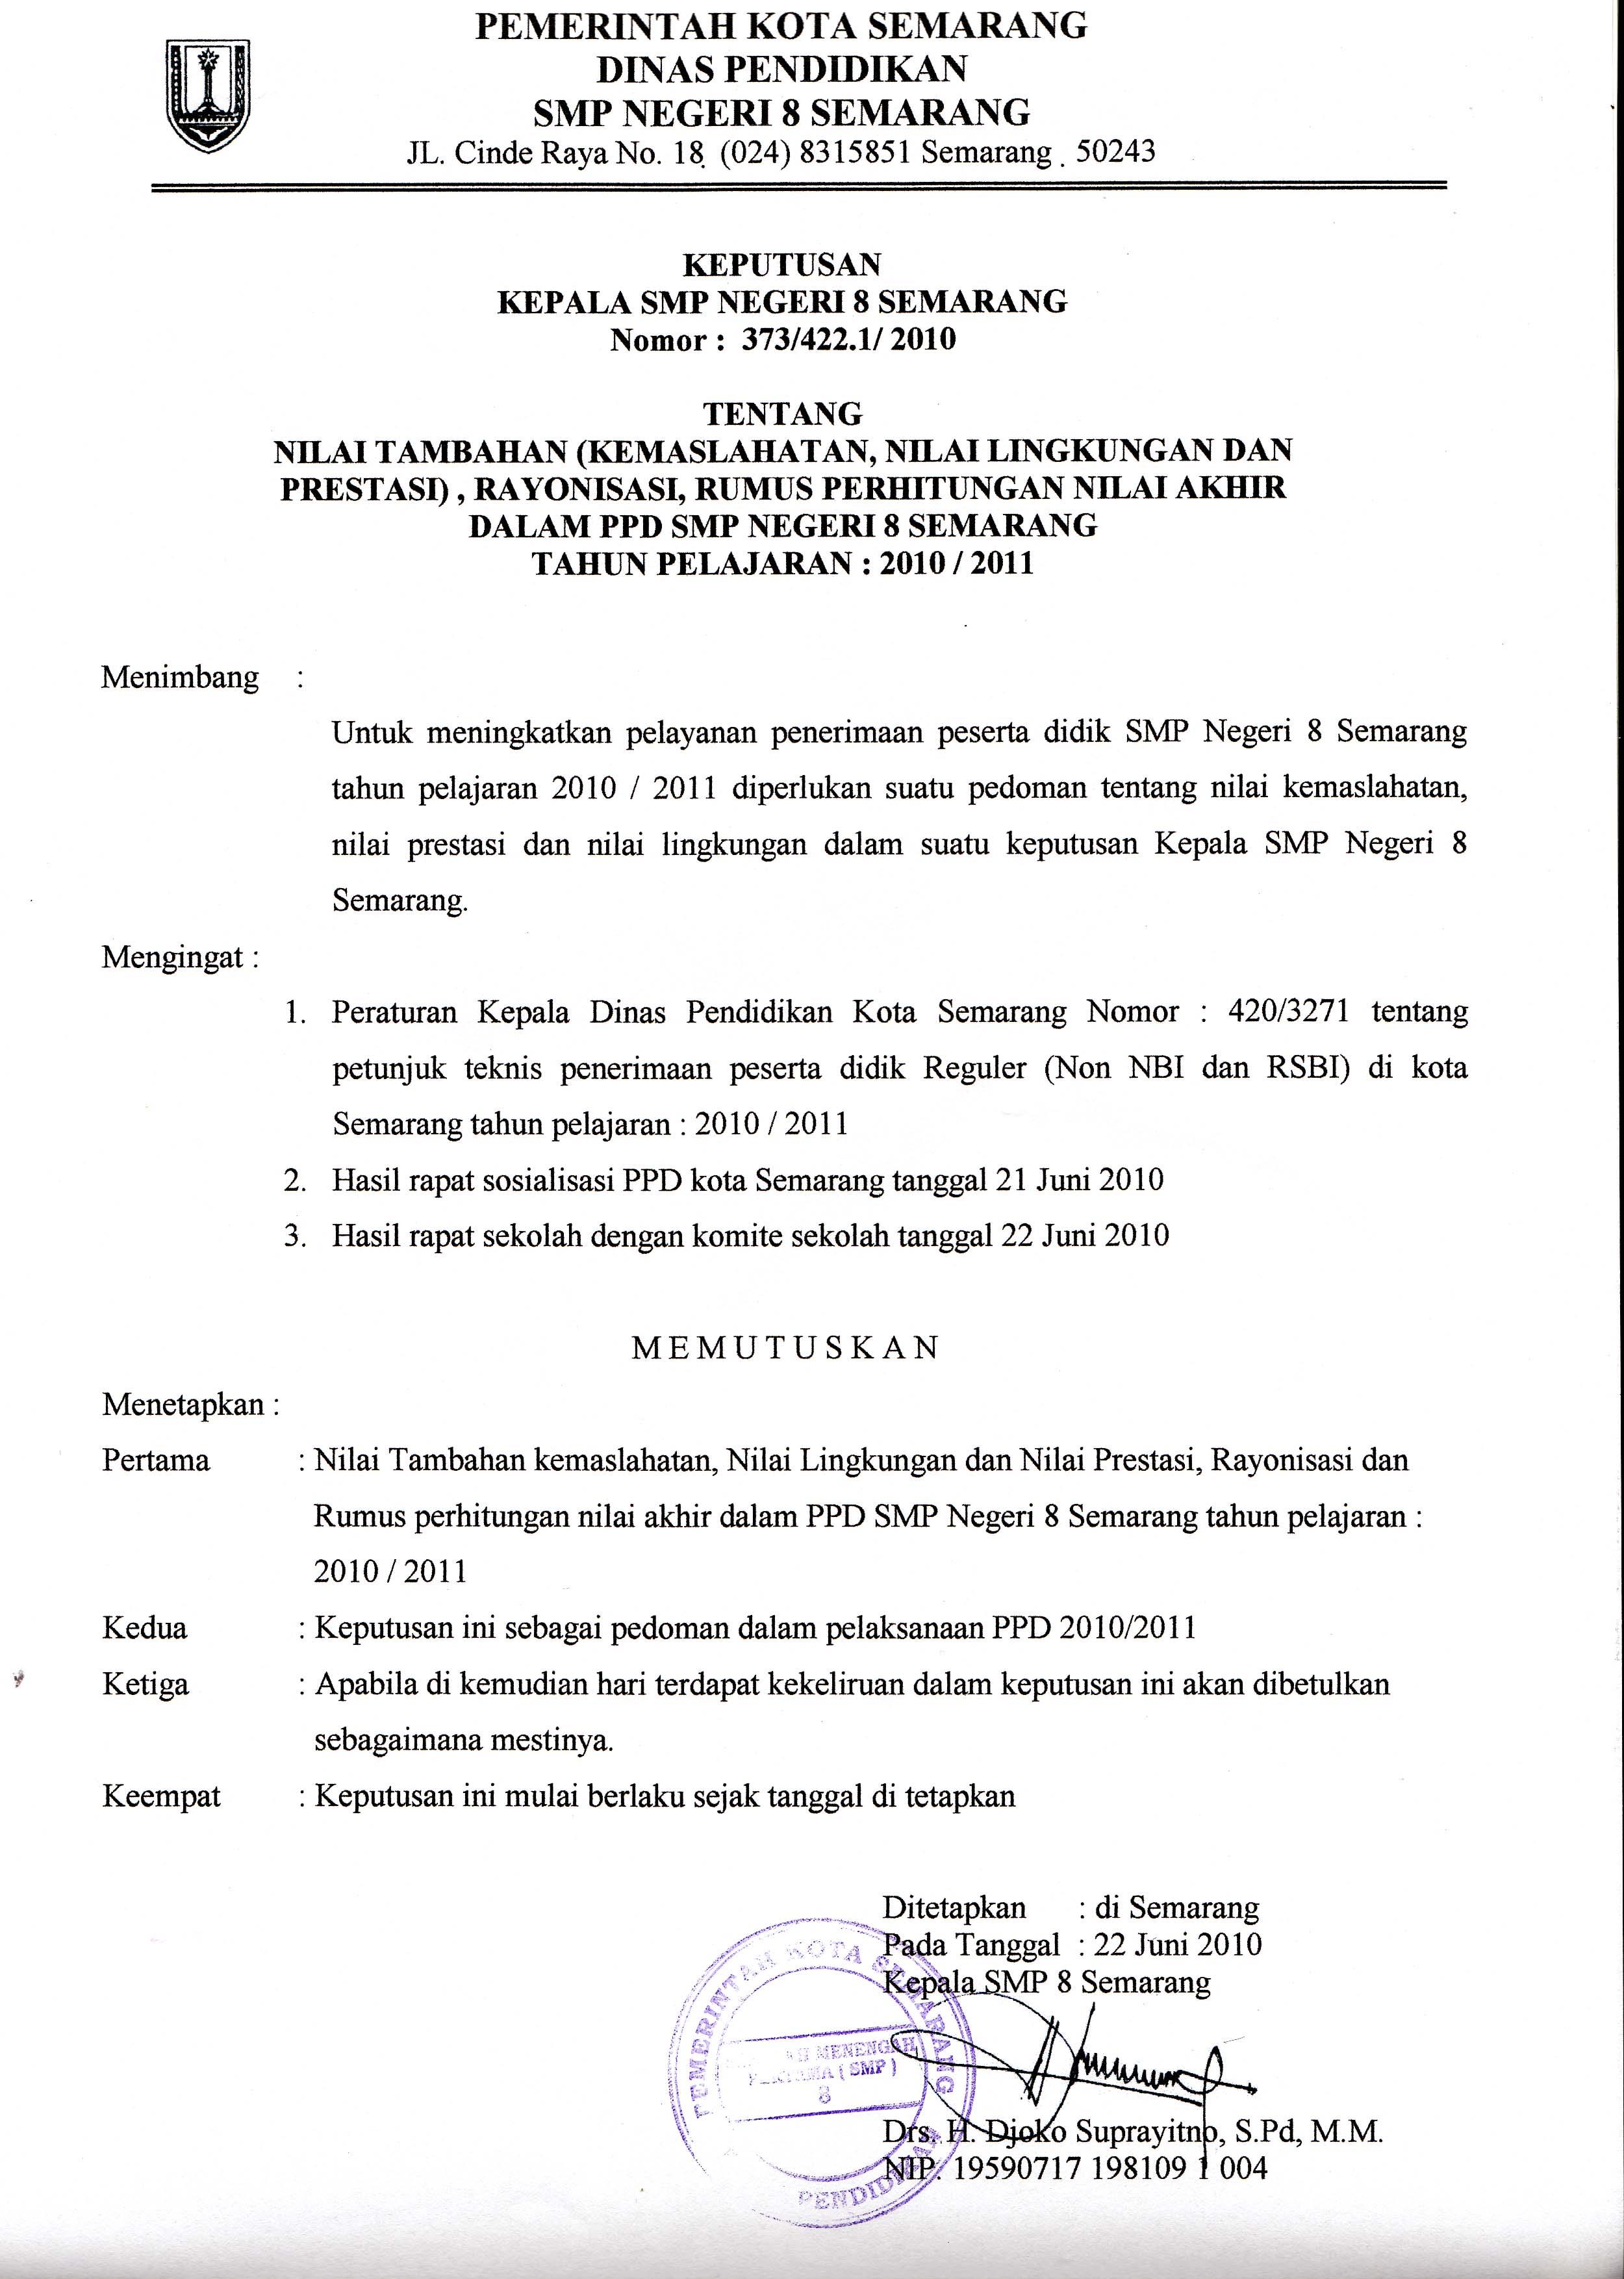 Keputusan Kepala Sekolah Tentang Nilai Tambahan Smp Negeri